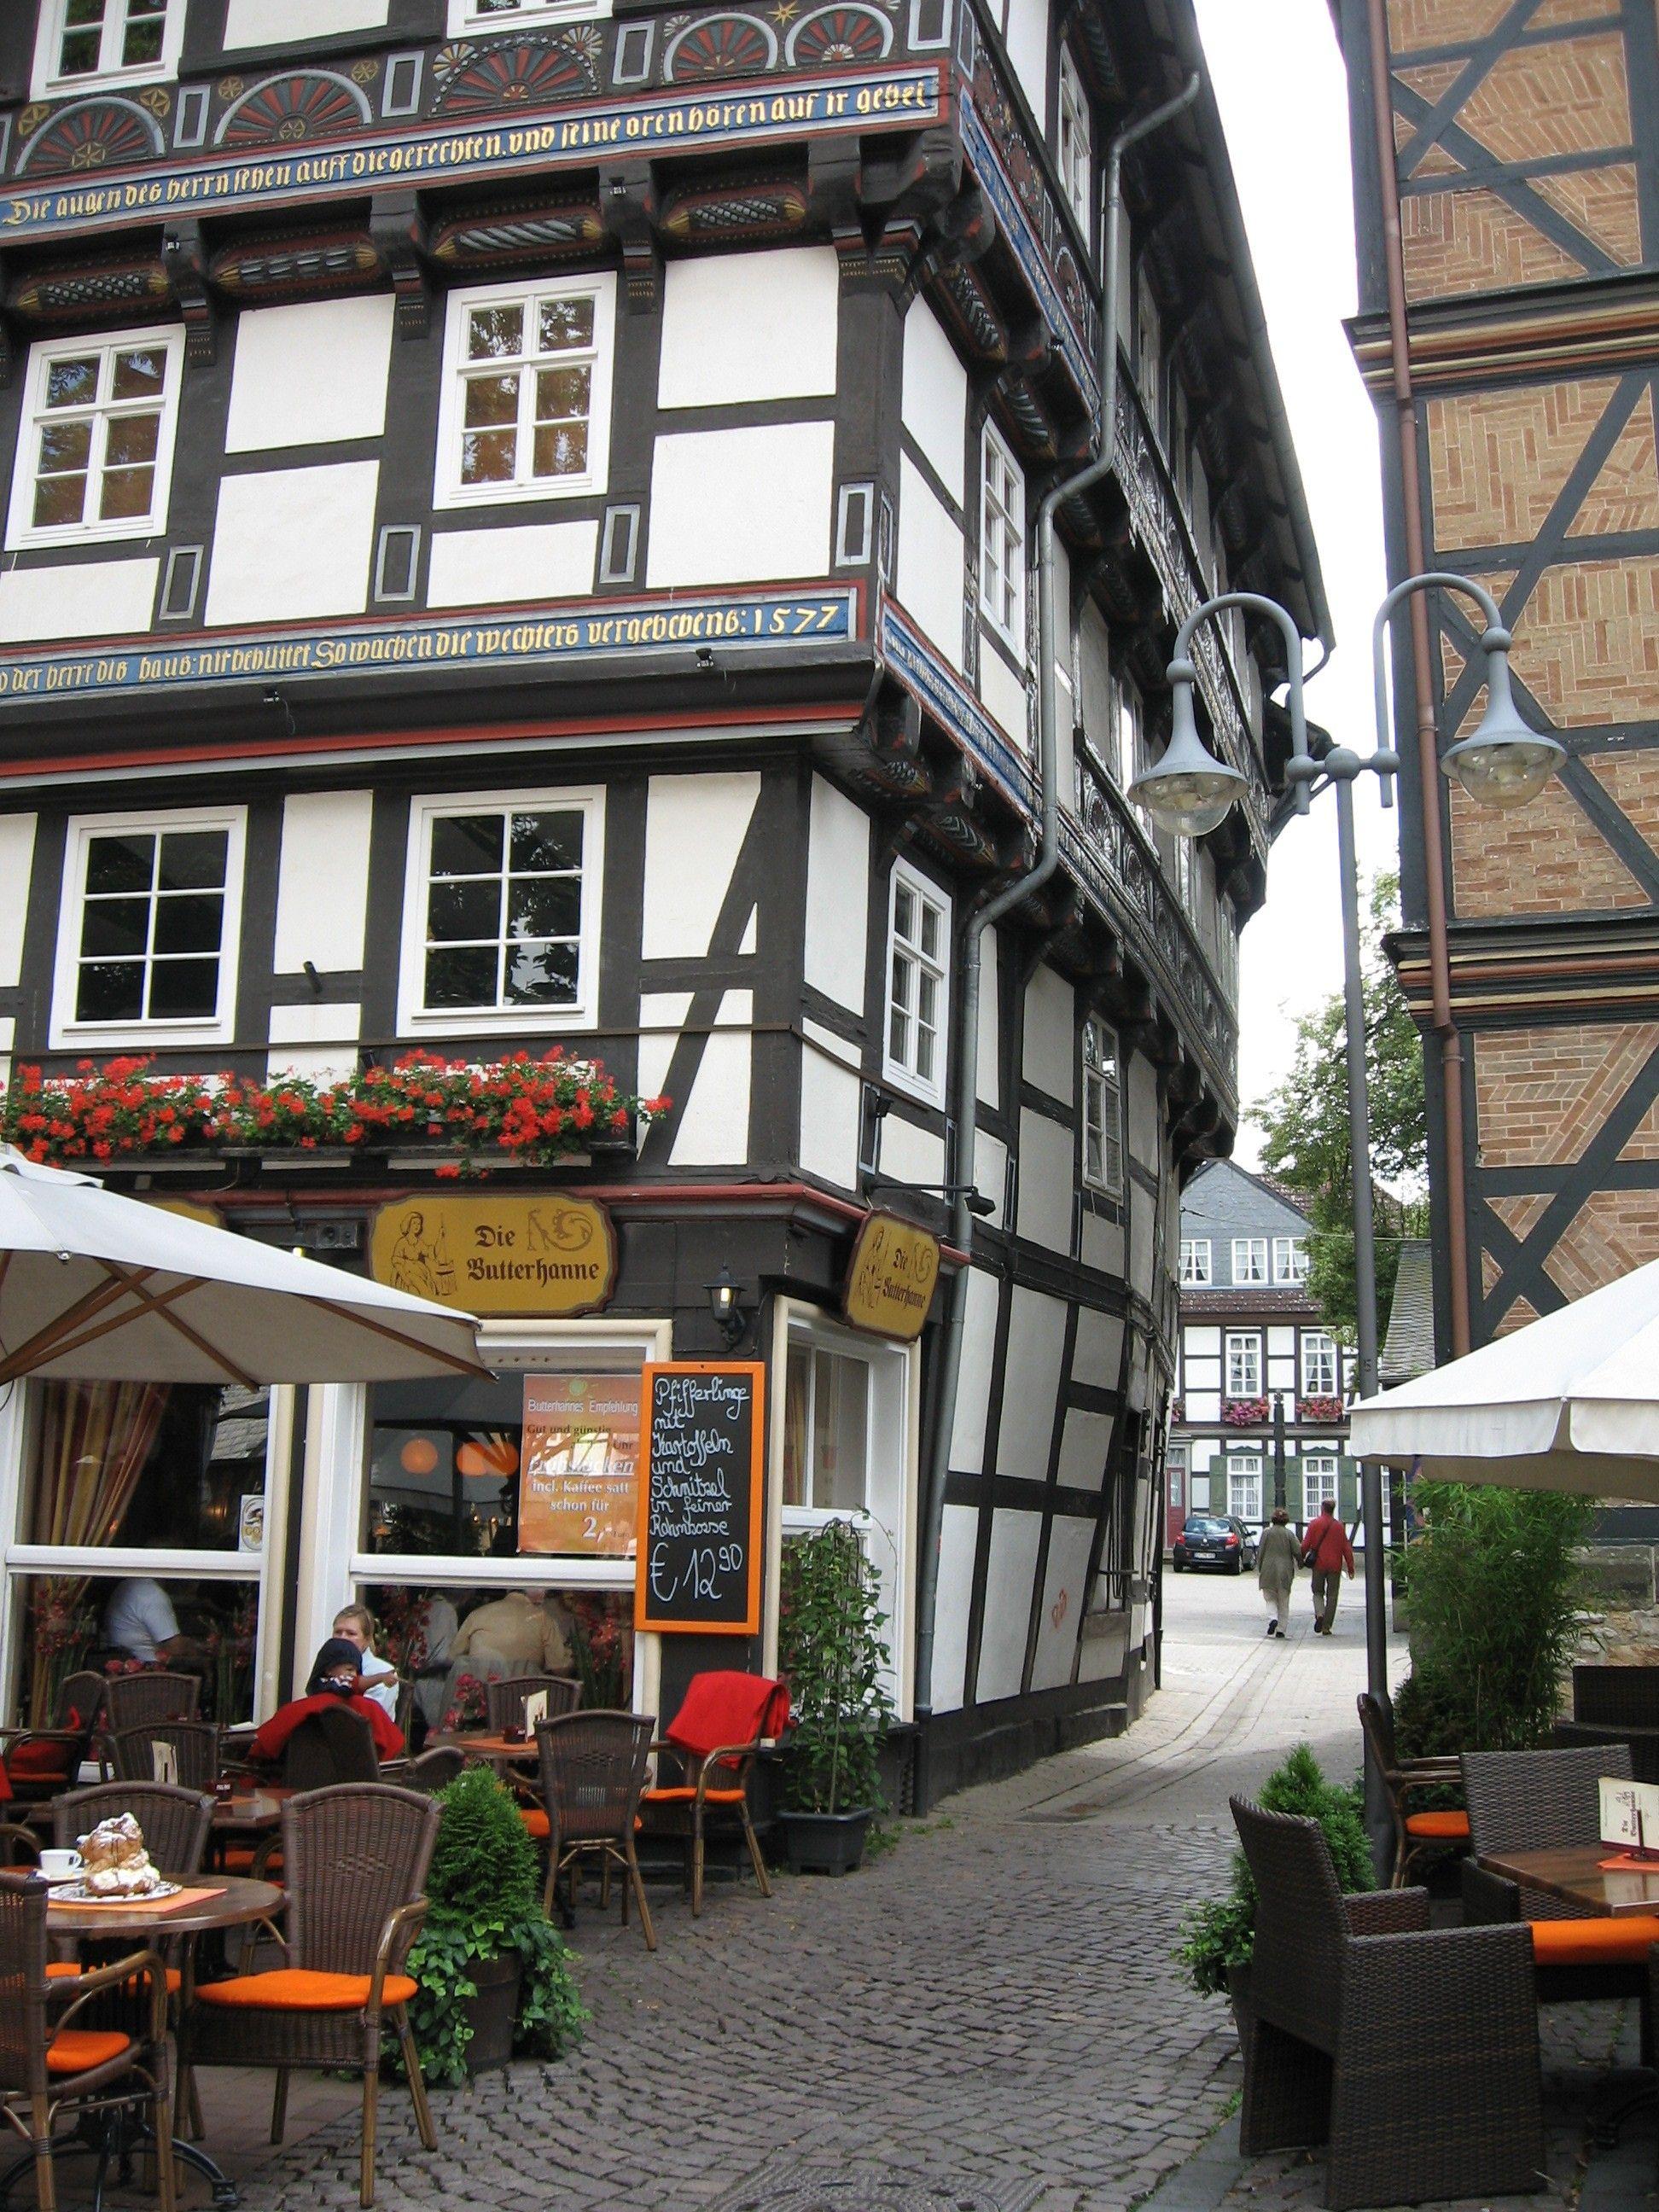 Goslar Old House Germany Germany Vacation Germany Travel Germany